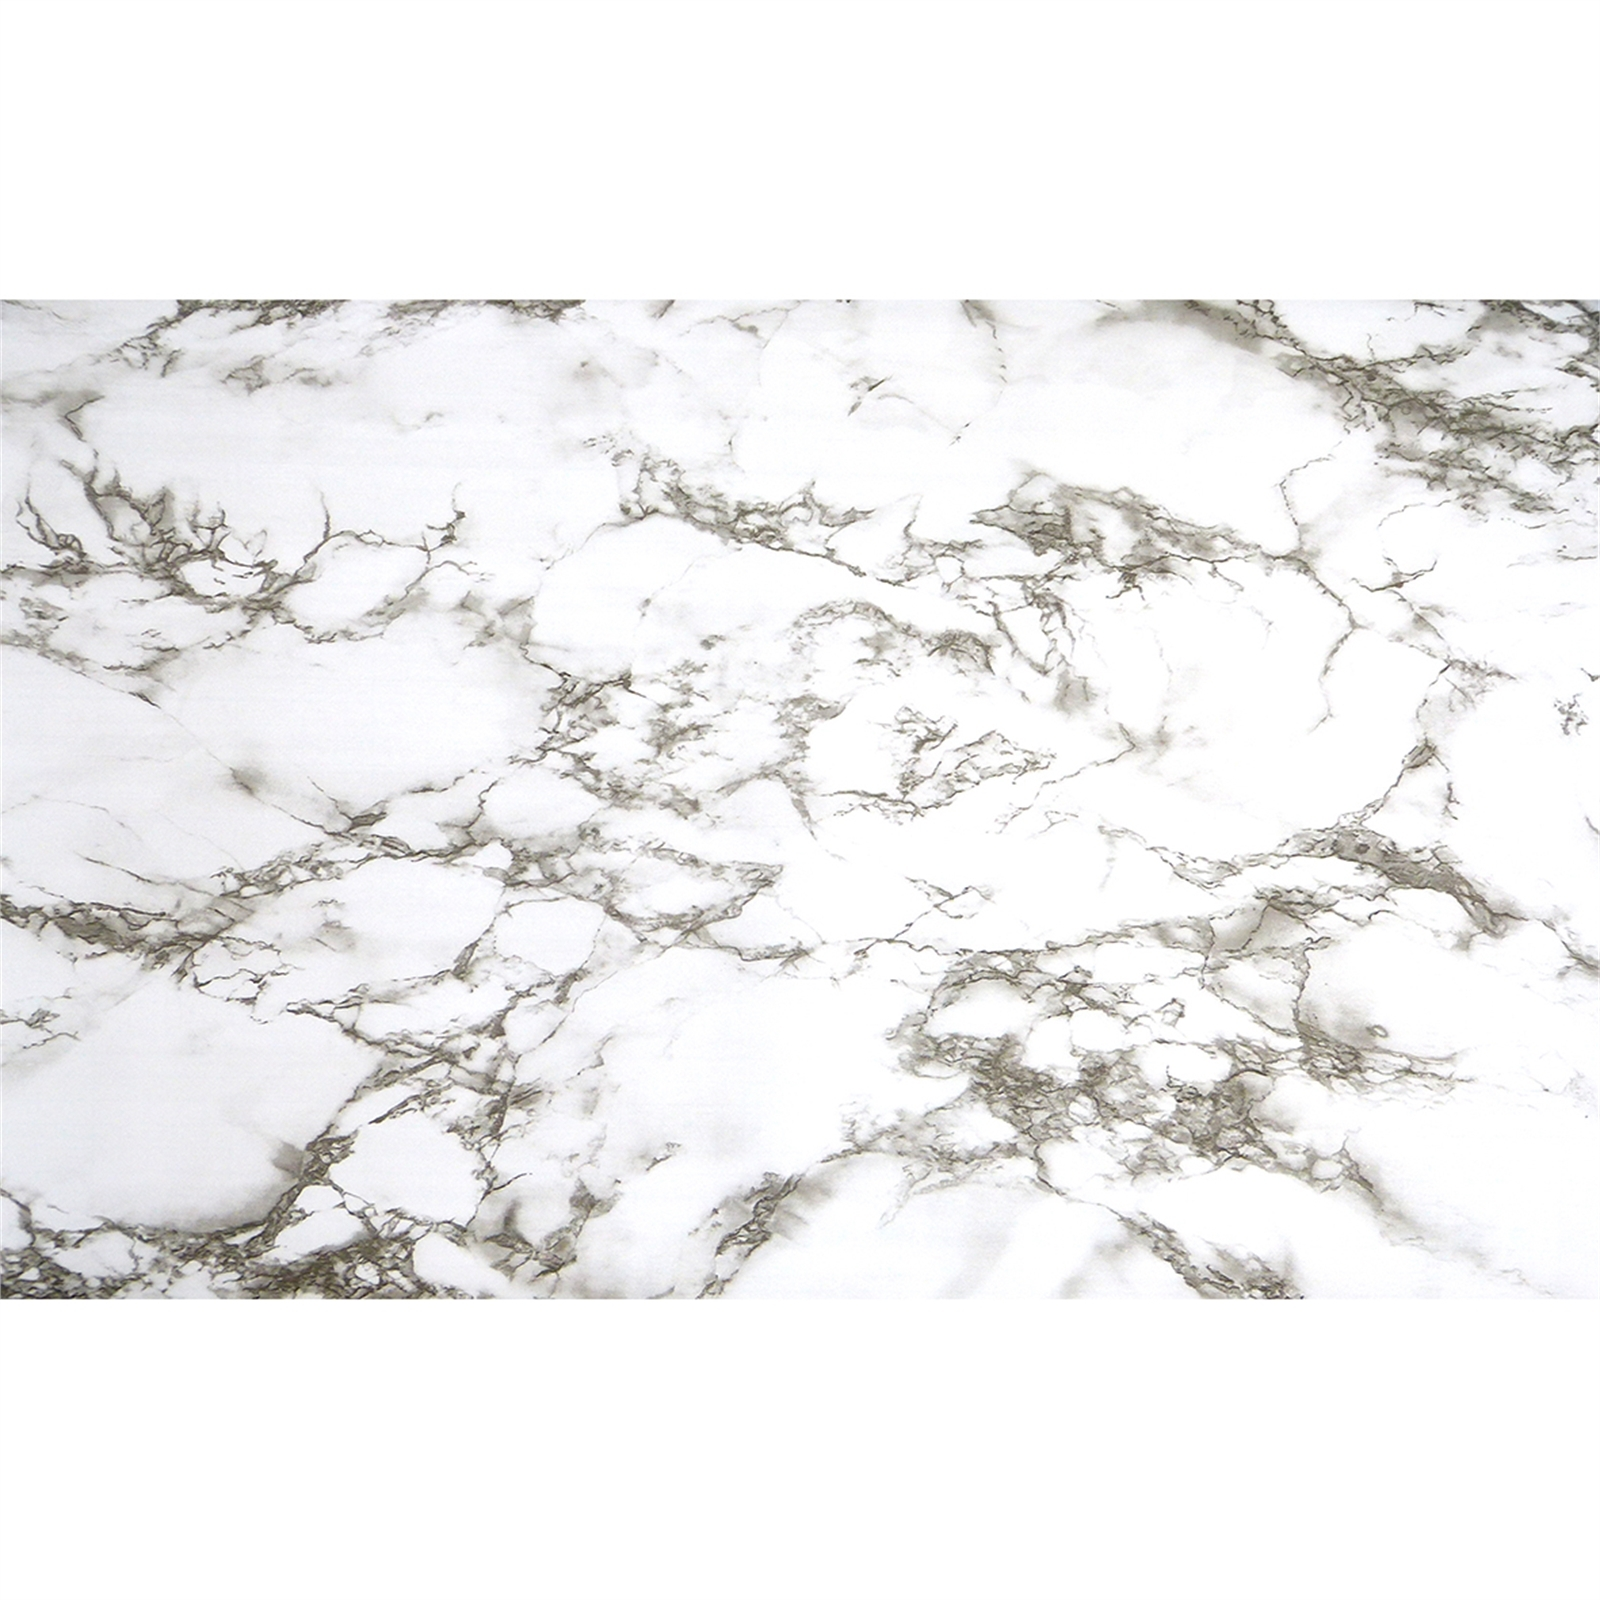 Boyle 45cm x 1.5m White Marble Self Adhesive Film